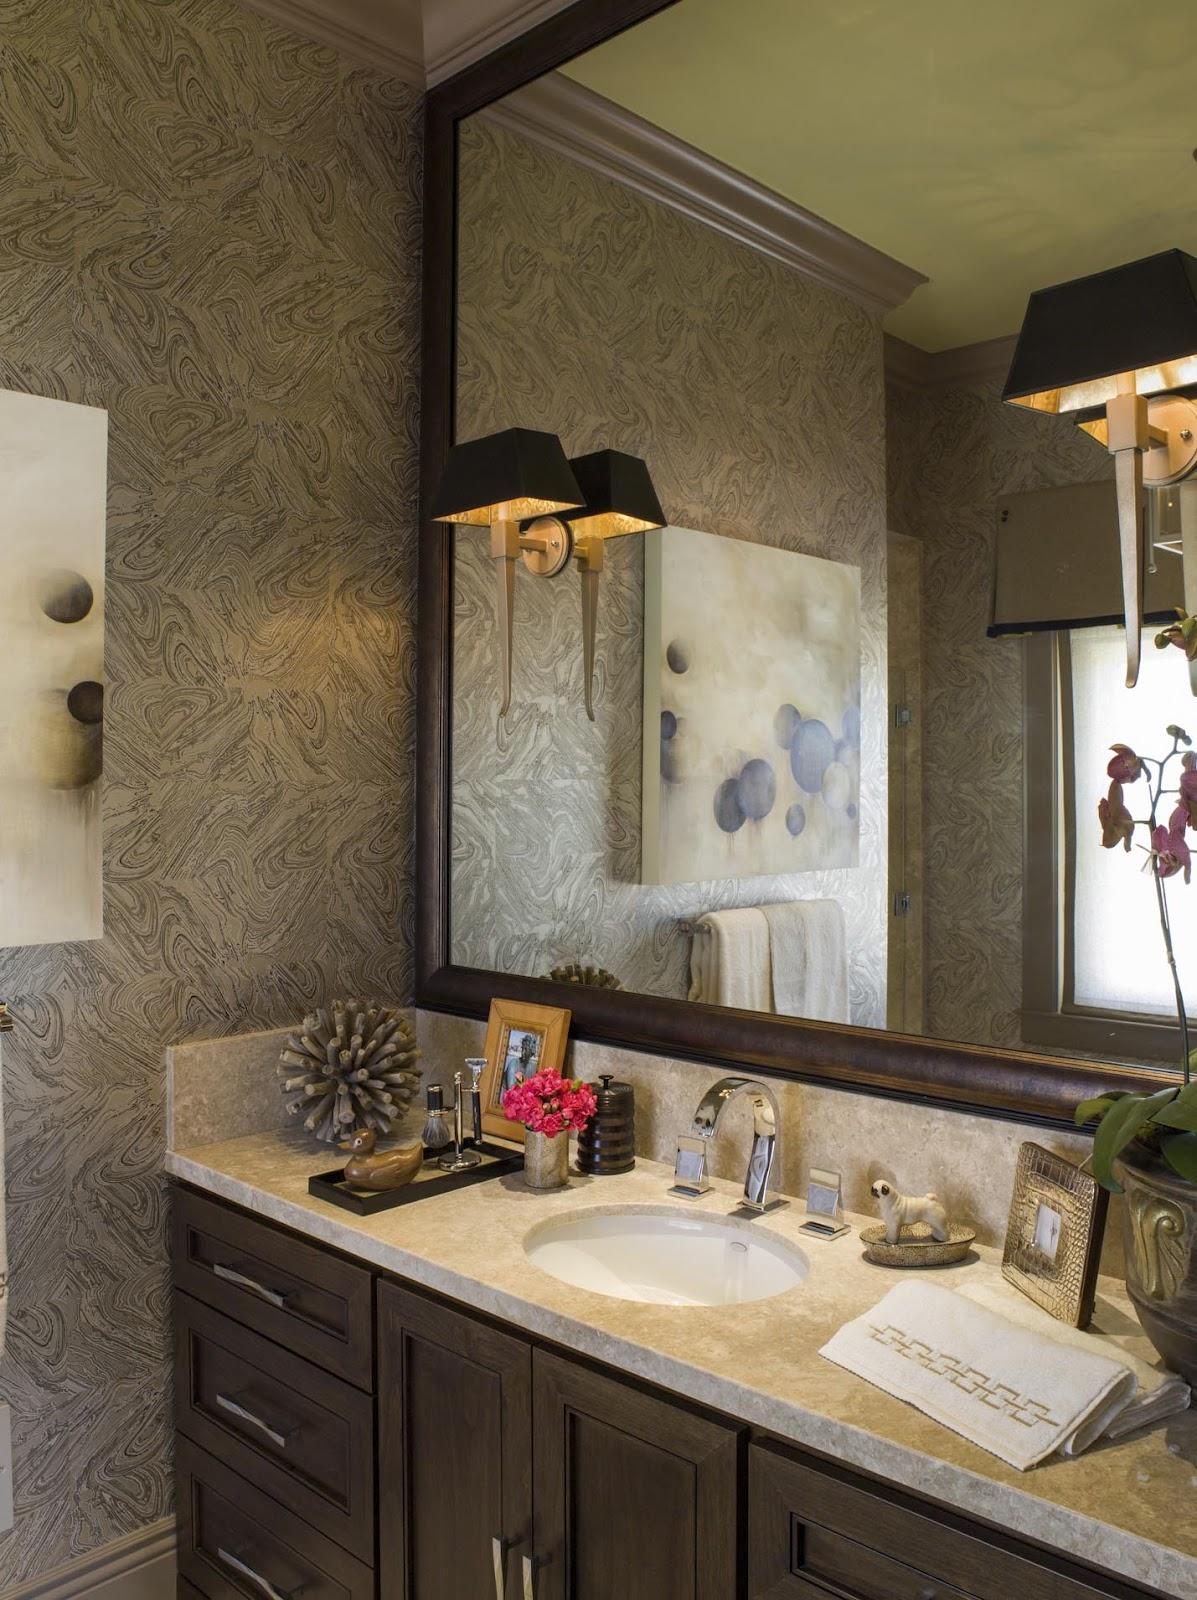 Bathroom Wallpaper Ideas: Bathroom Wallpaper Designs